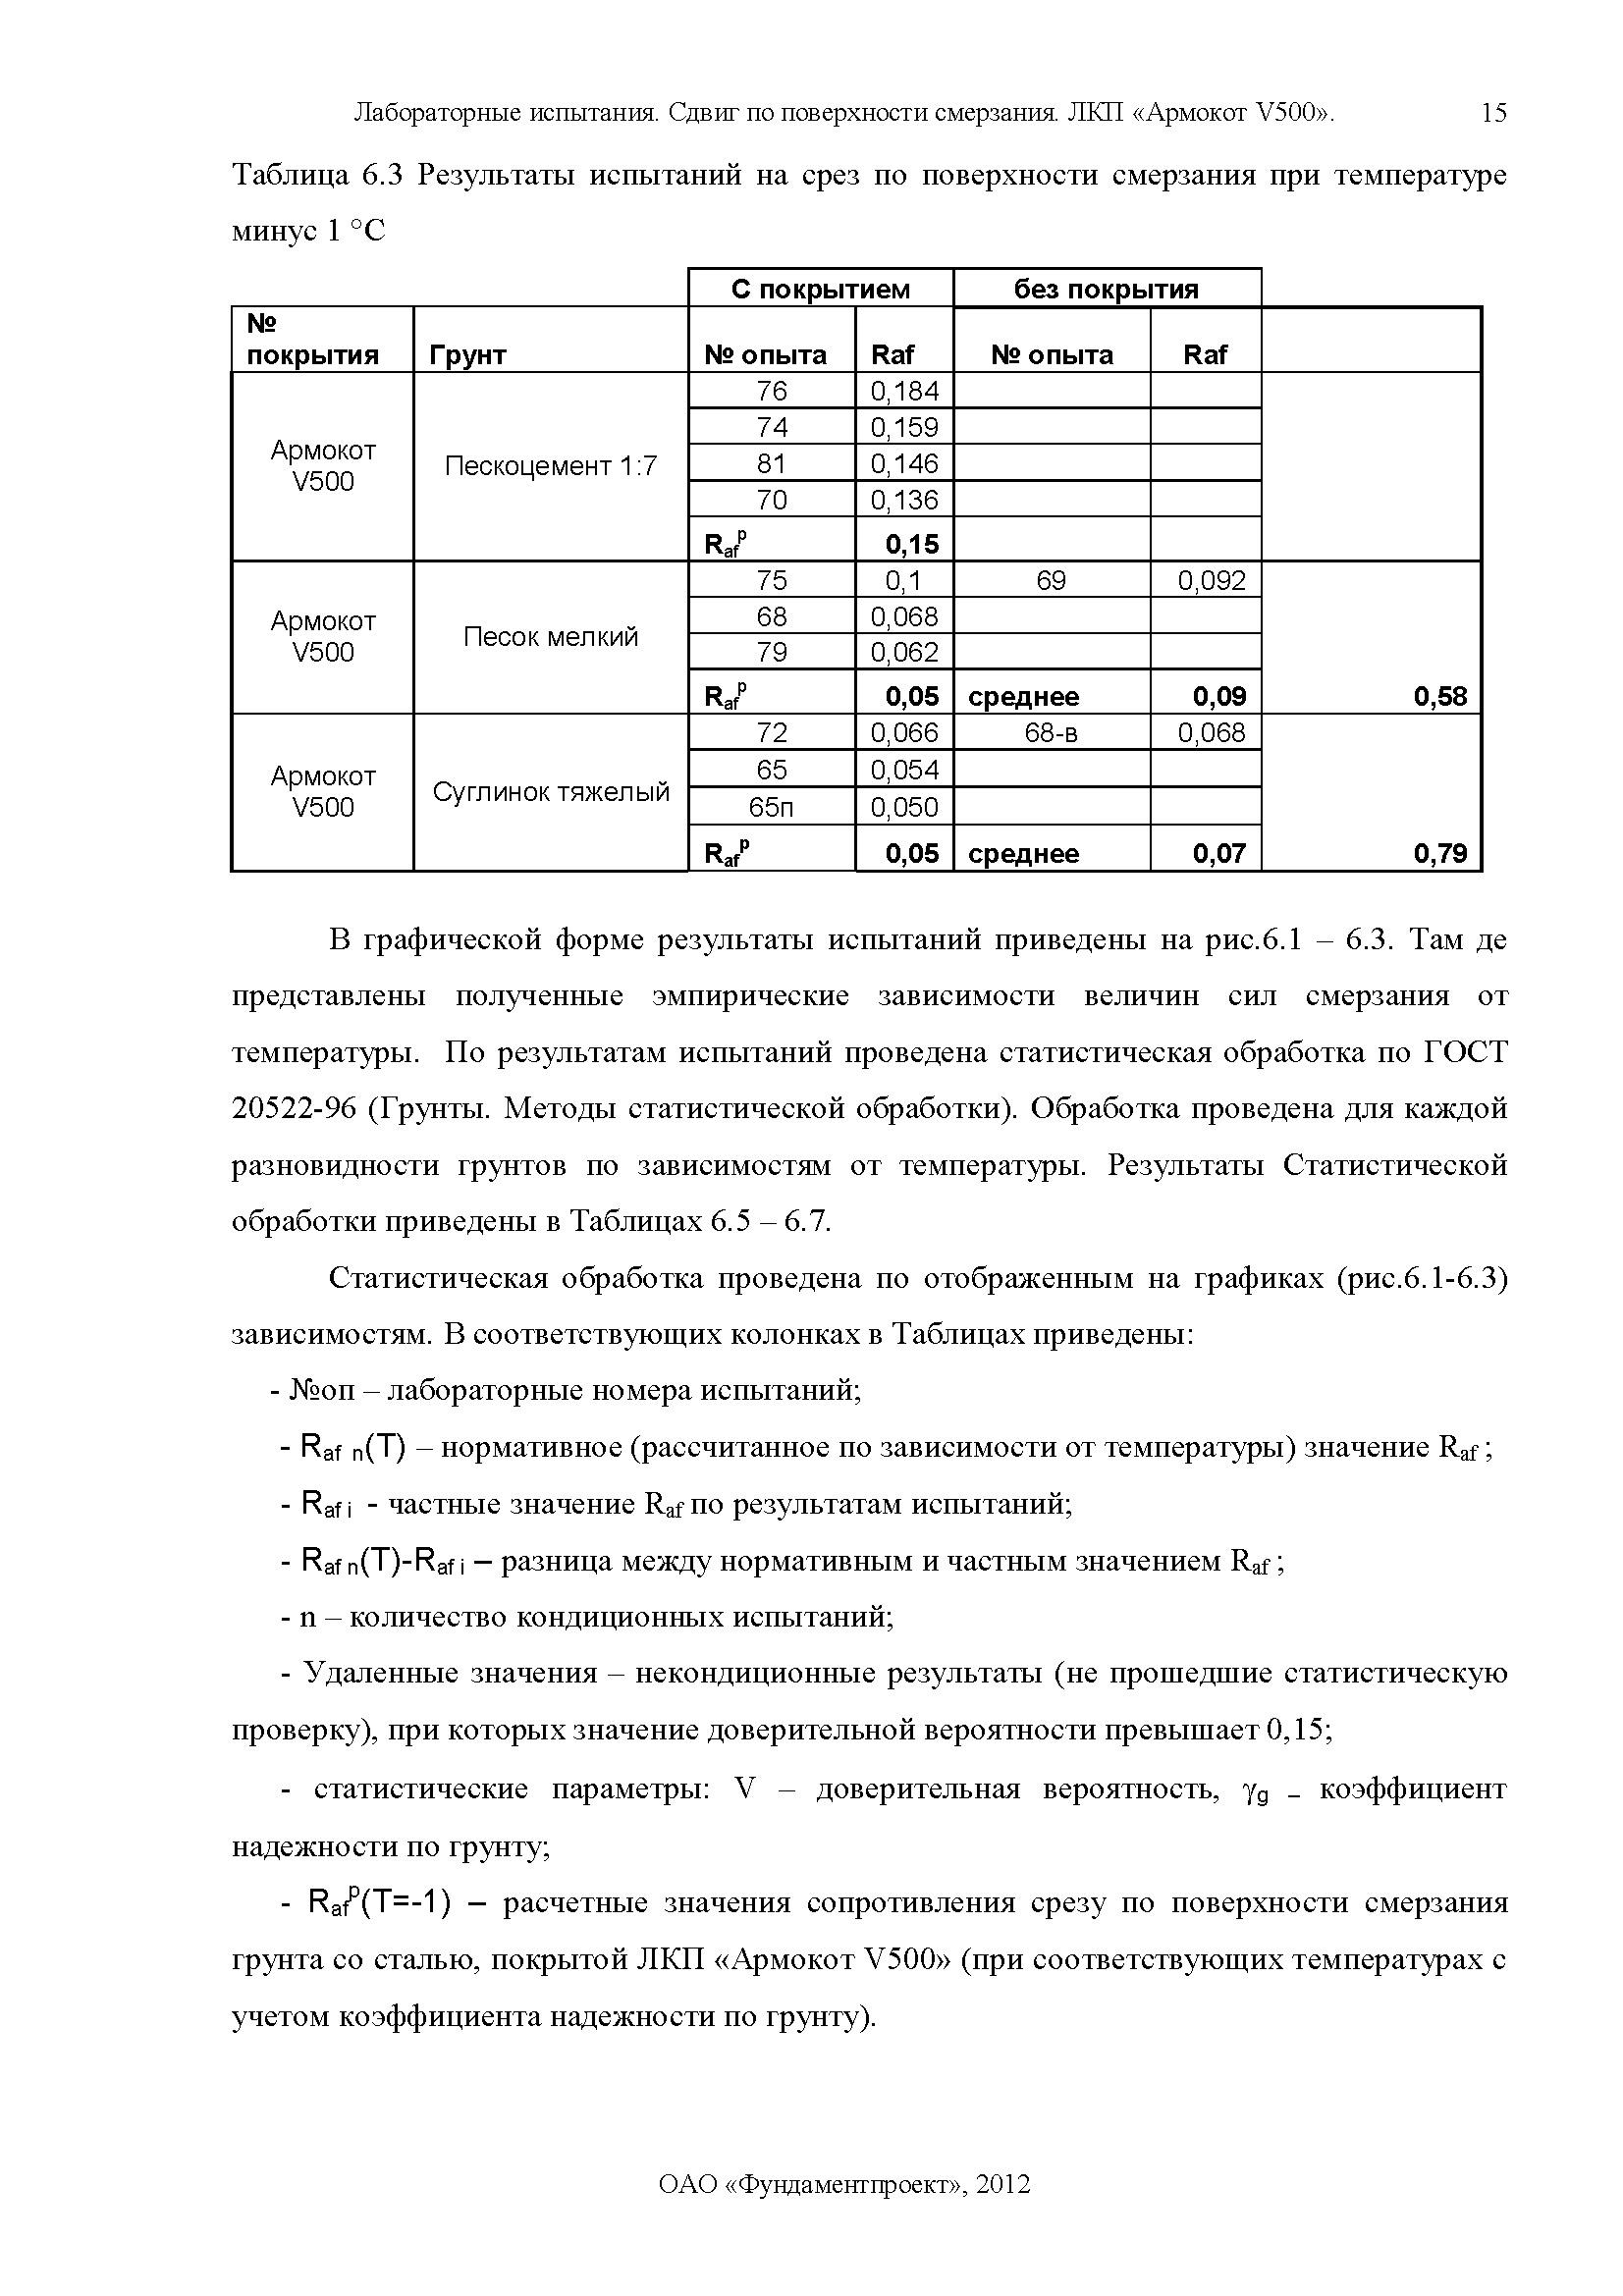 Отчет по сваям Армокот V500 Фундаментпроект_Страница_15